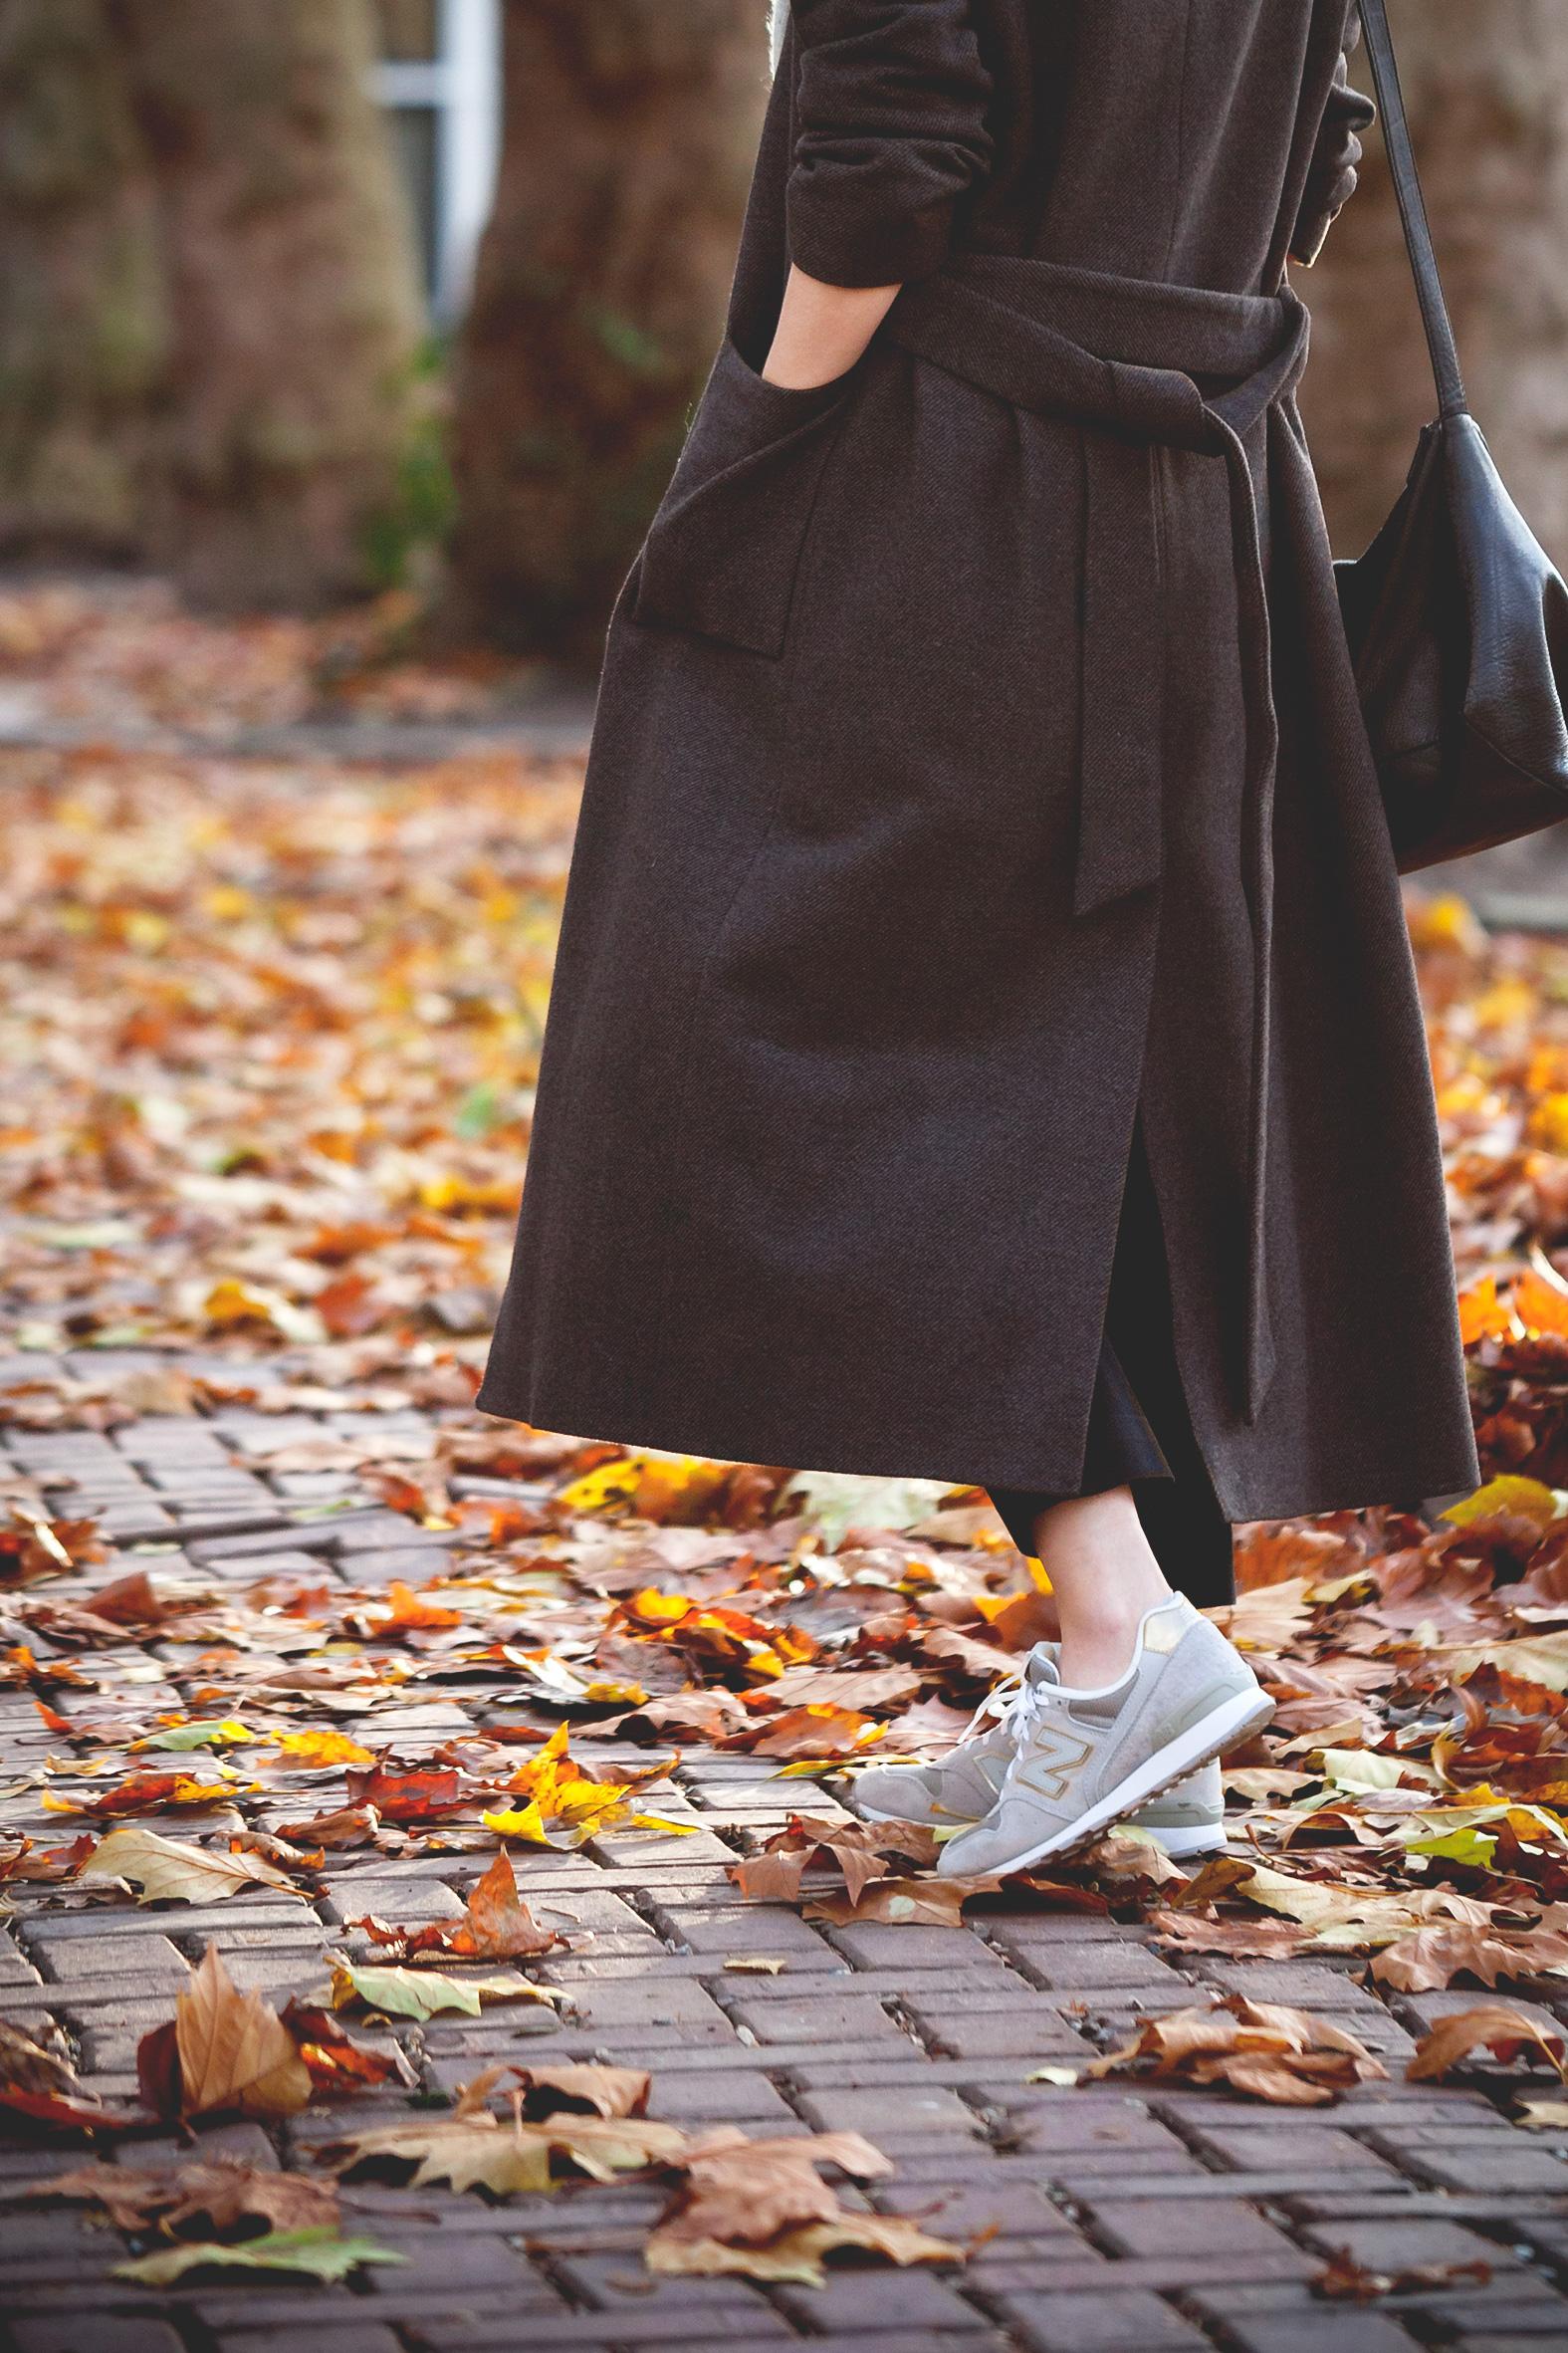 Long coats - fash-n-chips.com 02 -.jpg